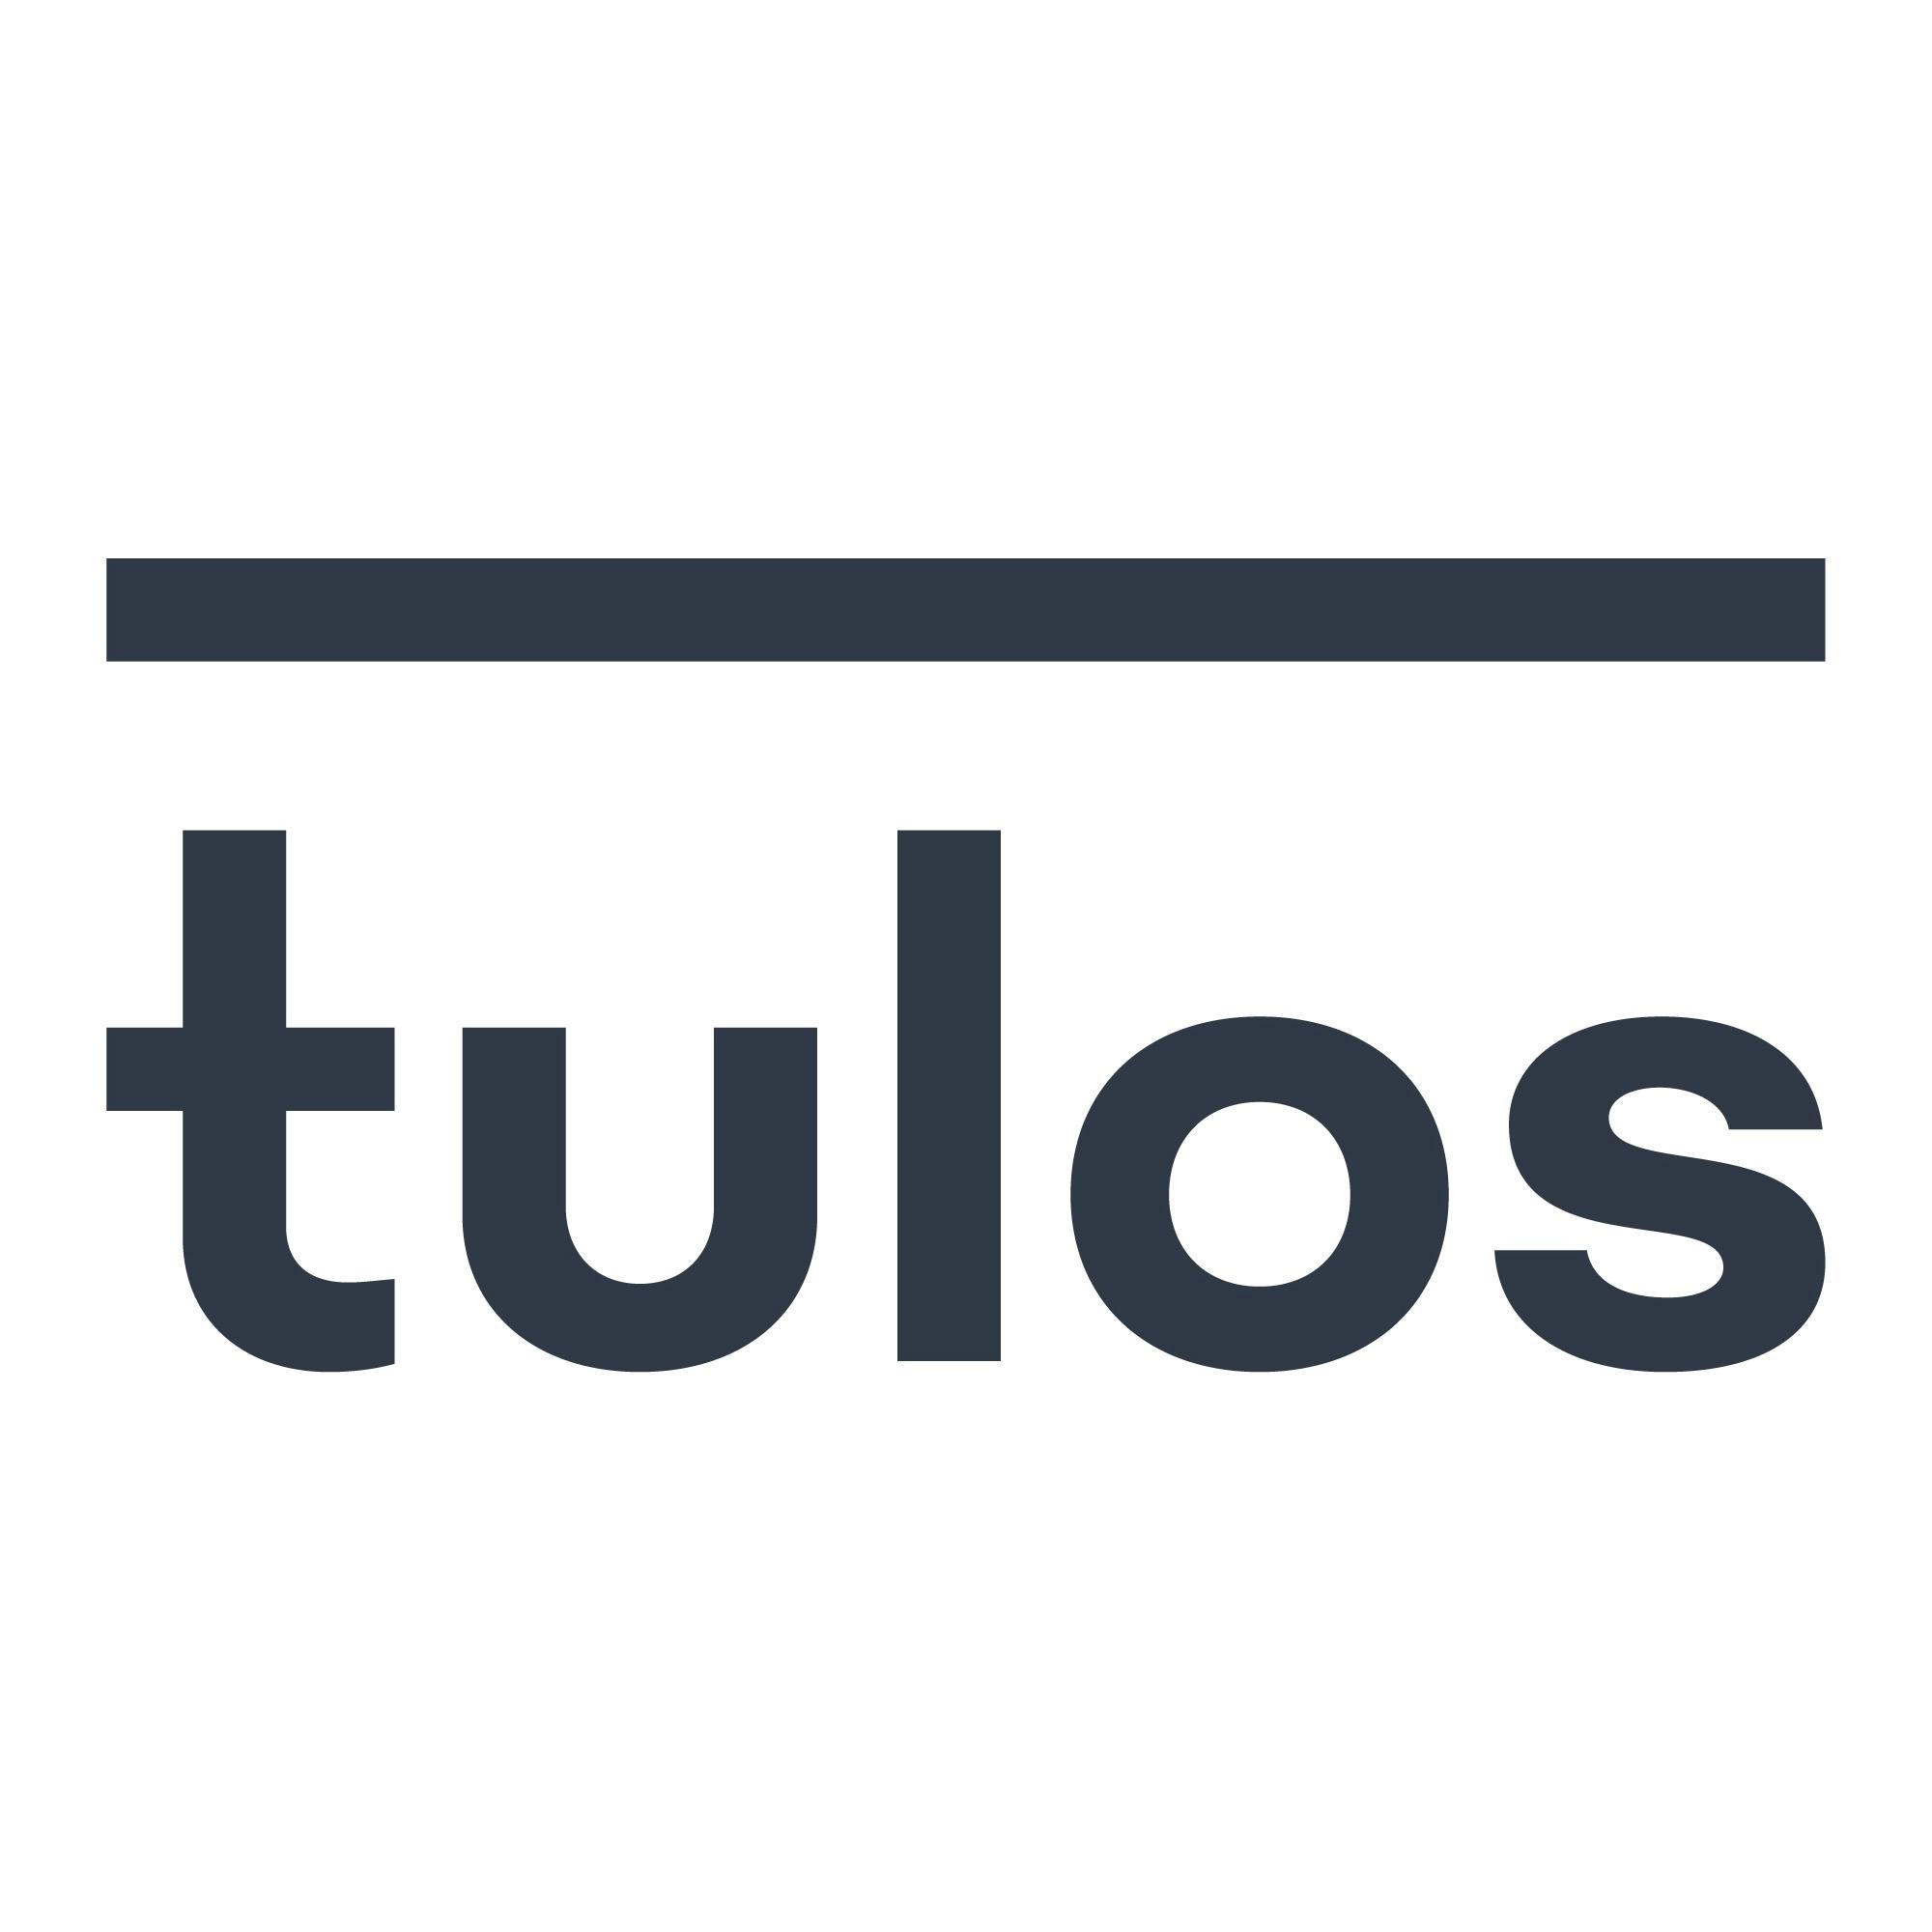 tulos_logo_sininen_web_nelio.jpg (96 KB)